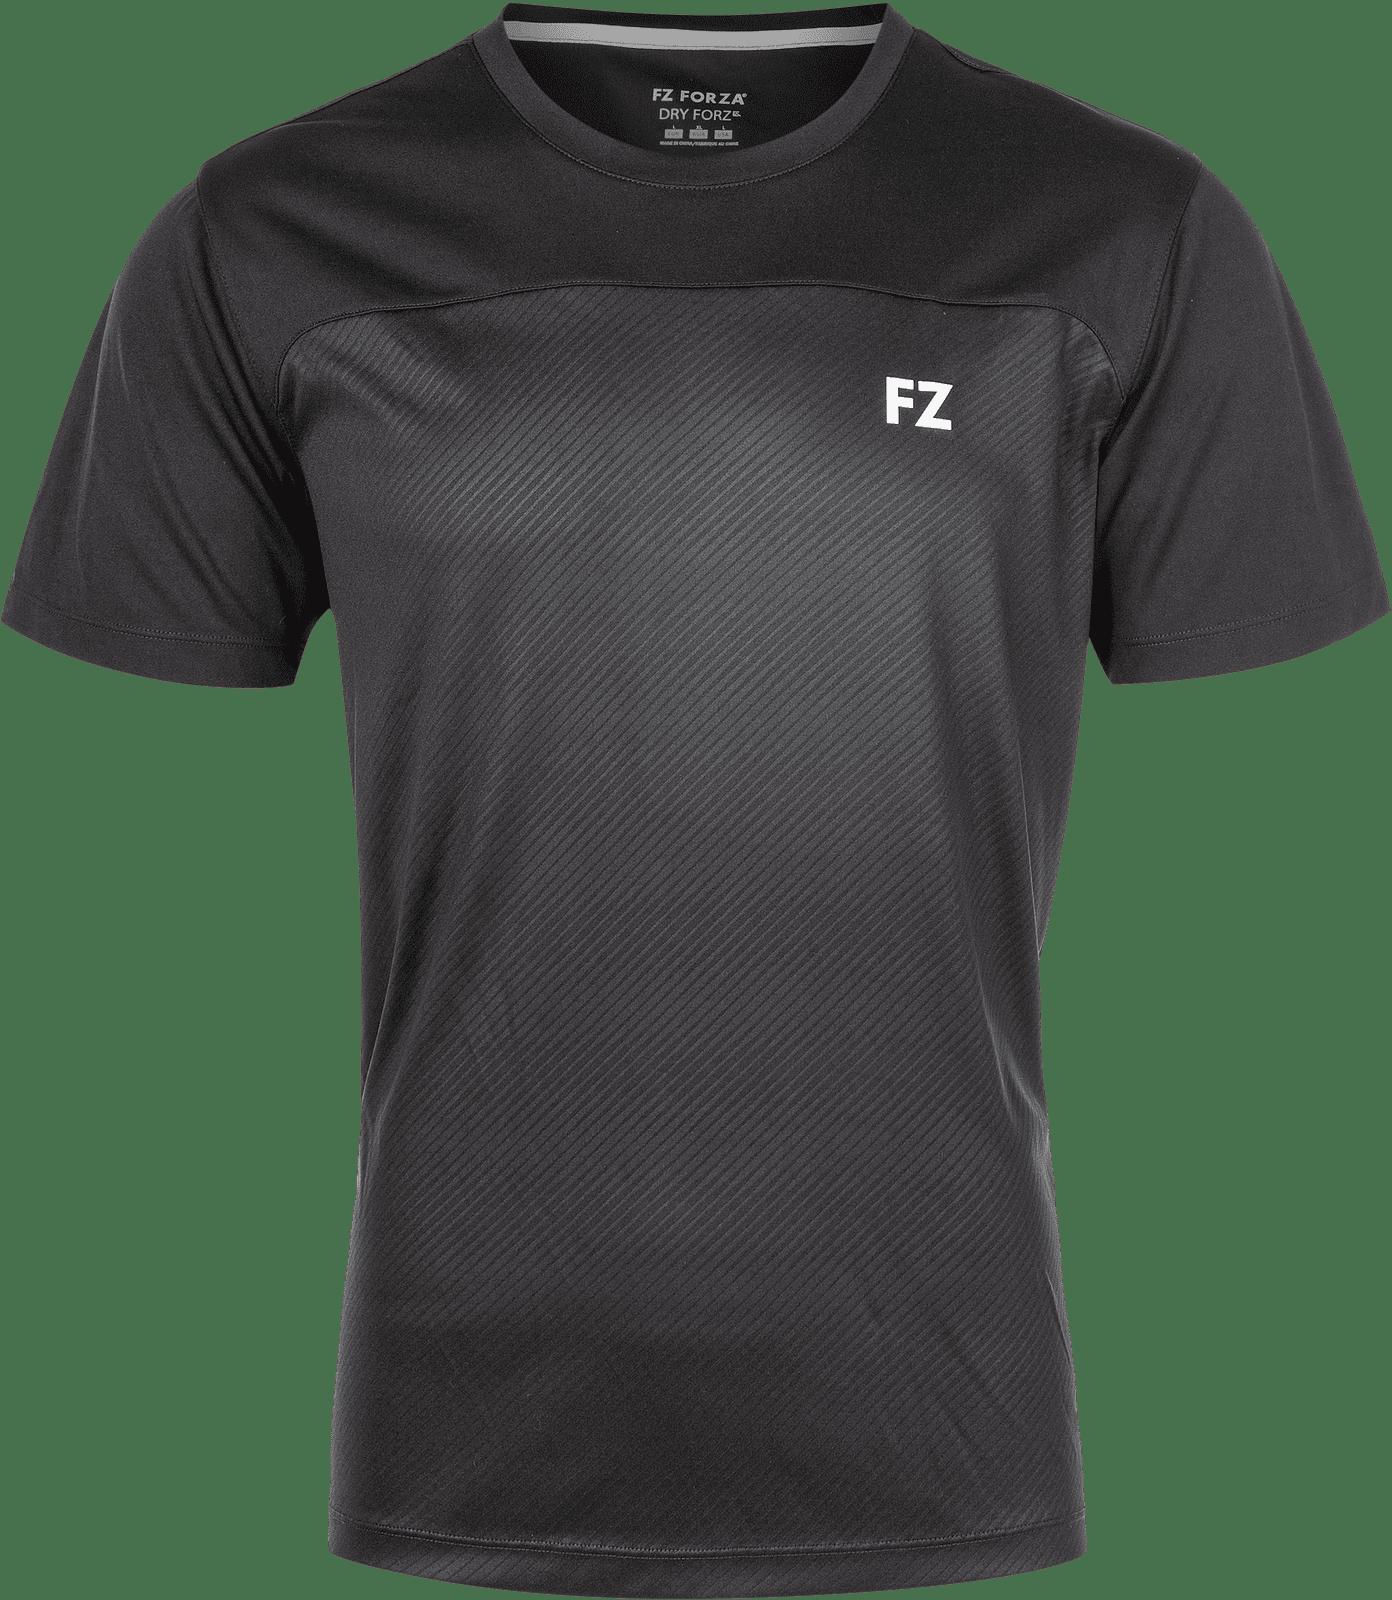 Forza Helsinki T-Shirt, 96 Black